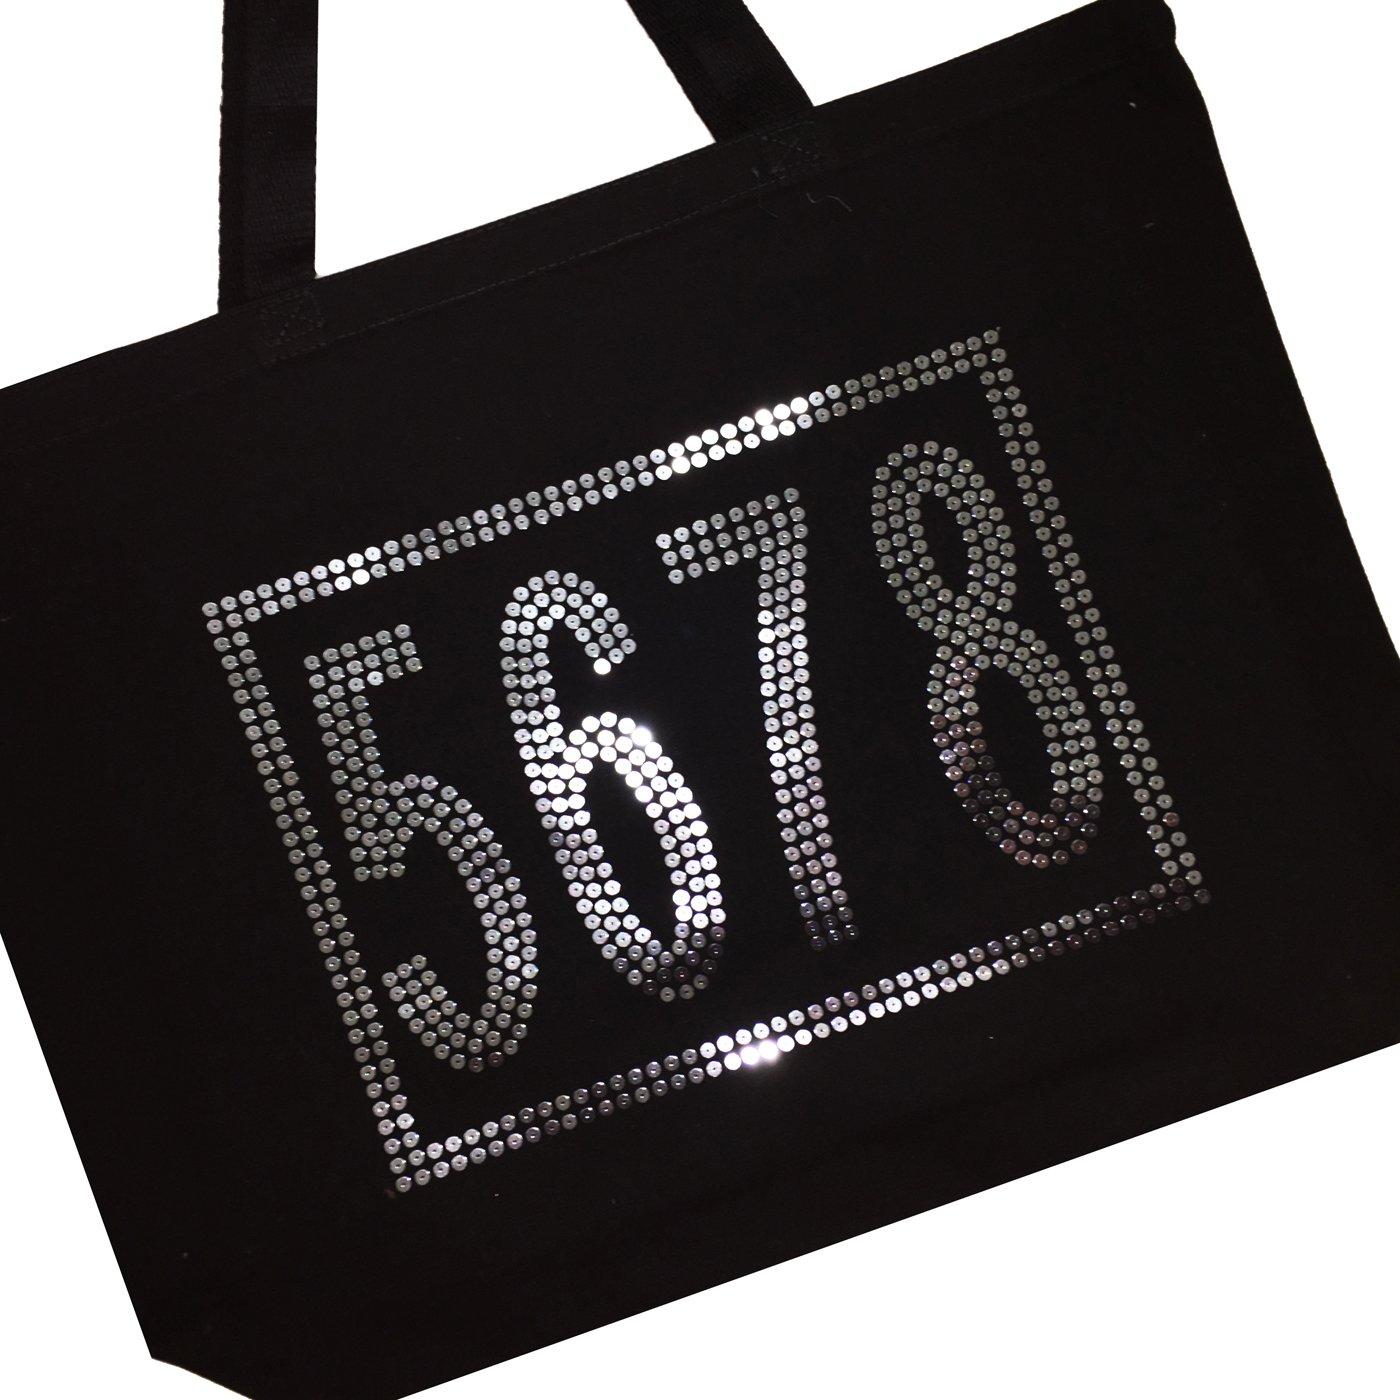 5-6-7-8 Sequin Dance Bag (Black)